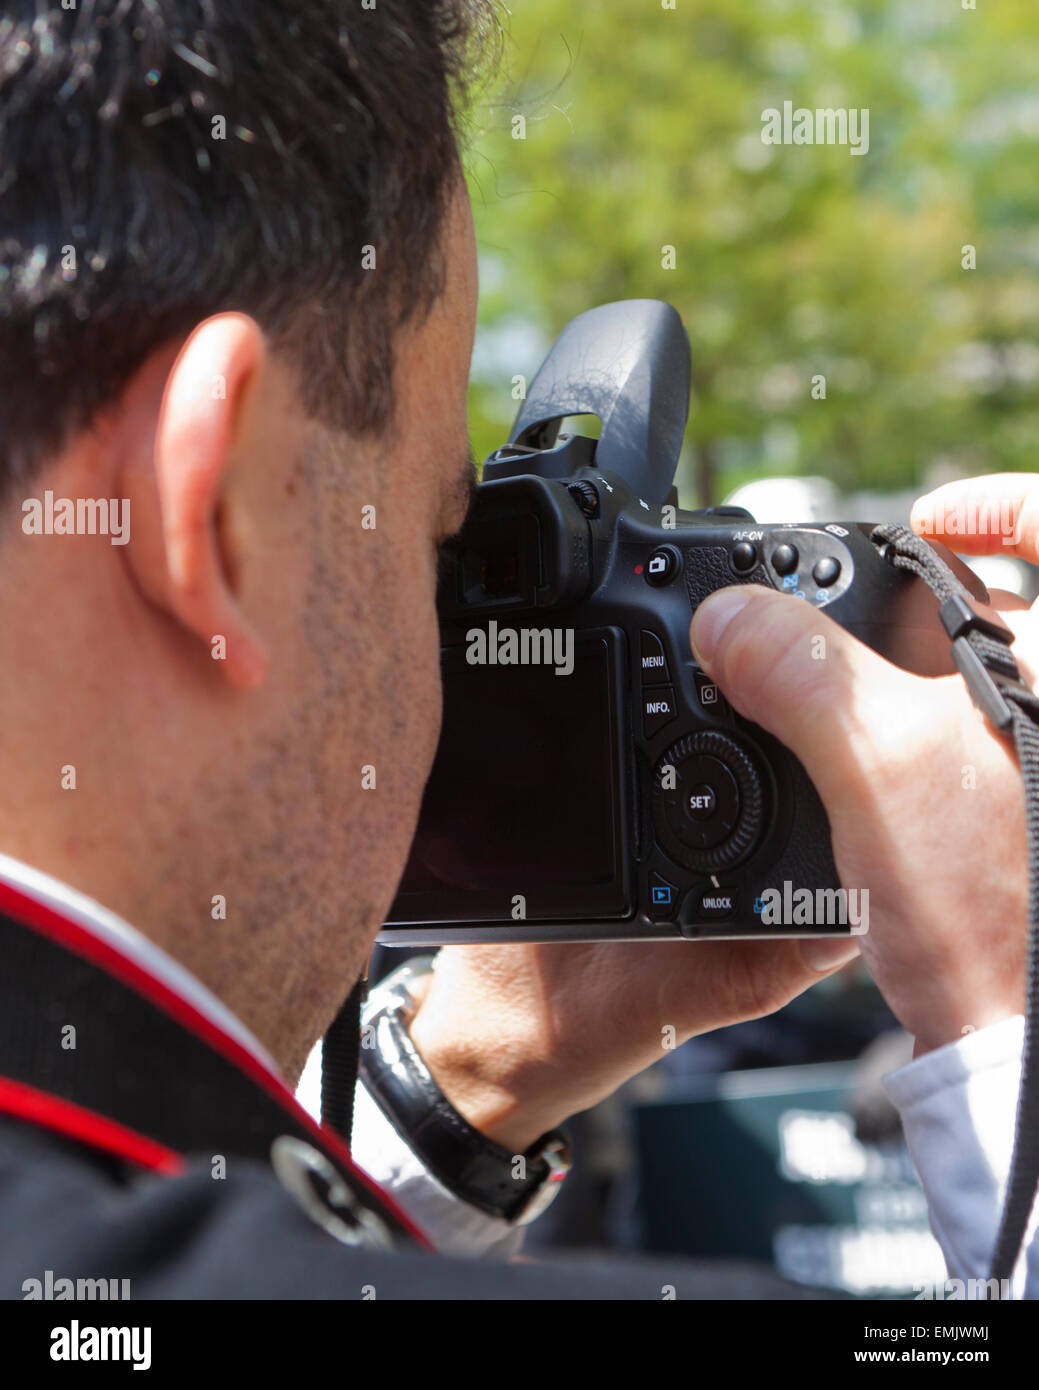 Man looking through viewfinder of dSLR camera - USA - Stock Image